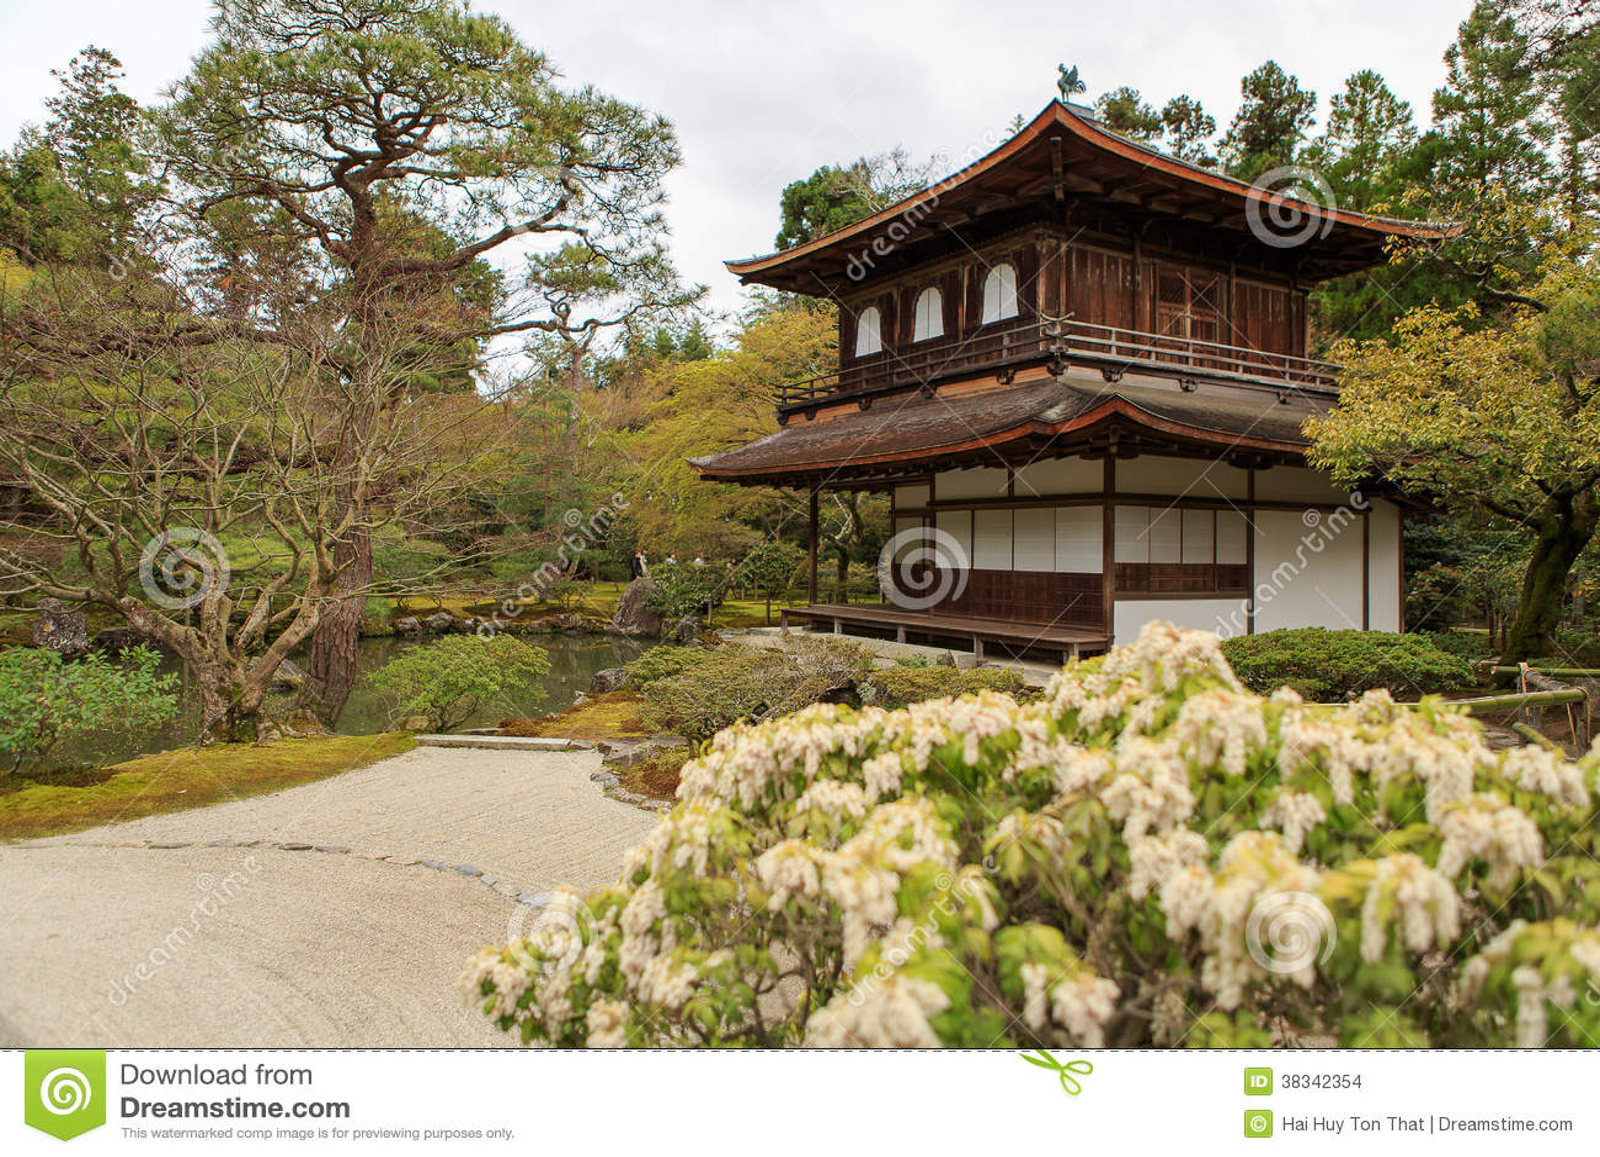 Silver Pavillion In Japanese Zen Garden In Kyoto Stock Photo - Image ...